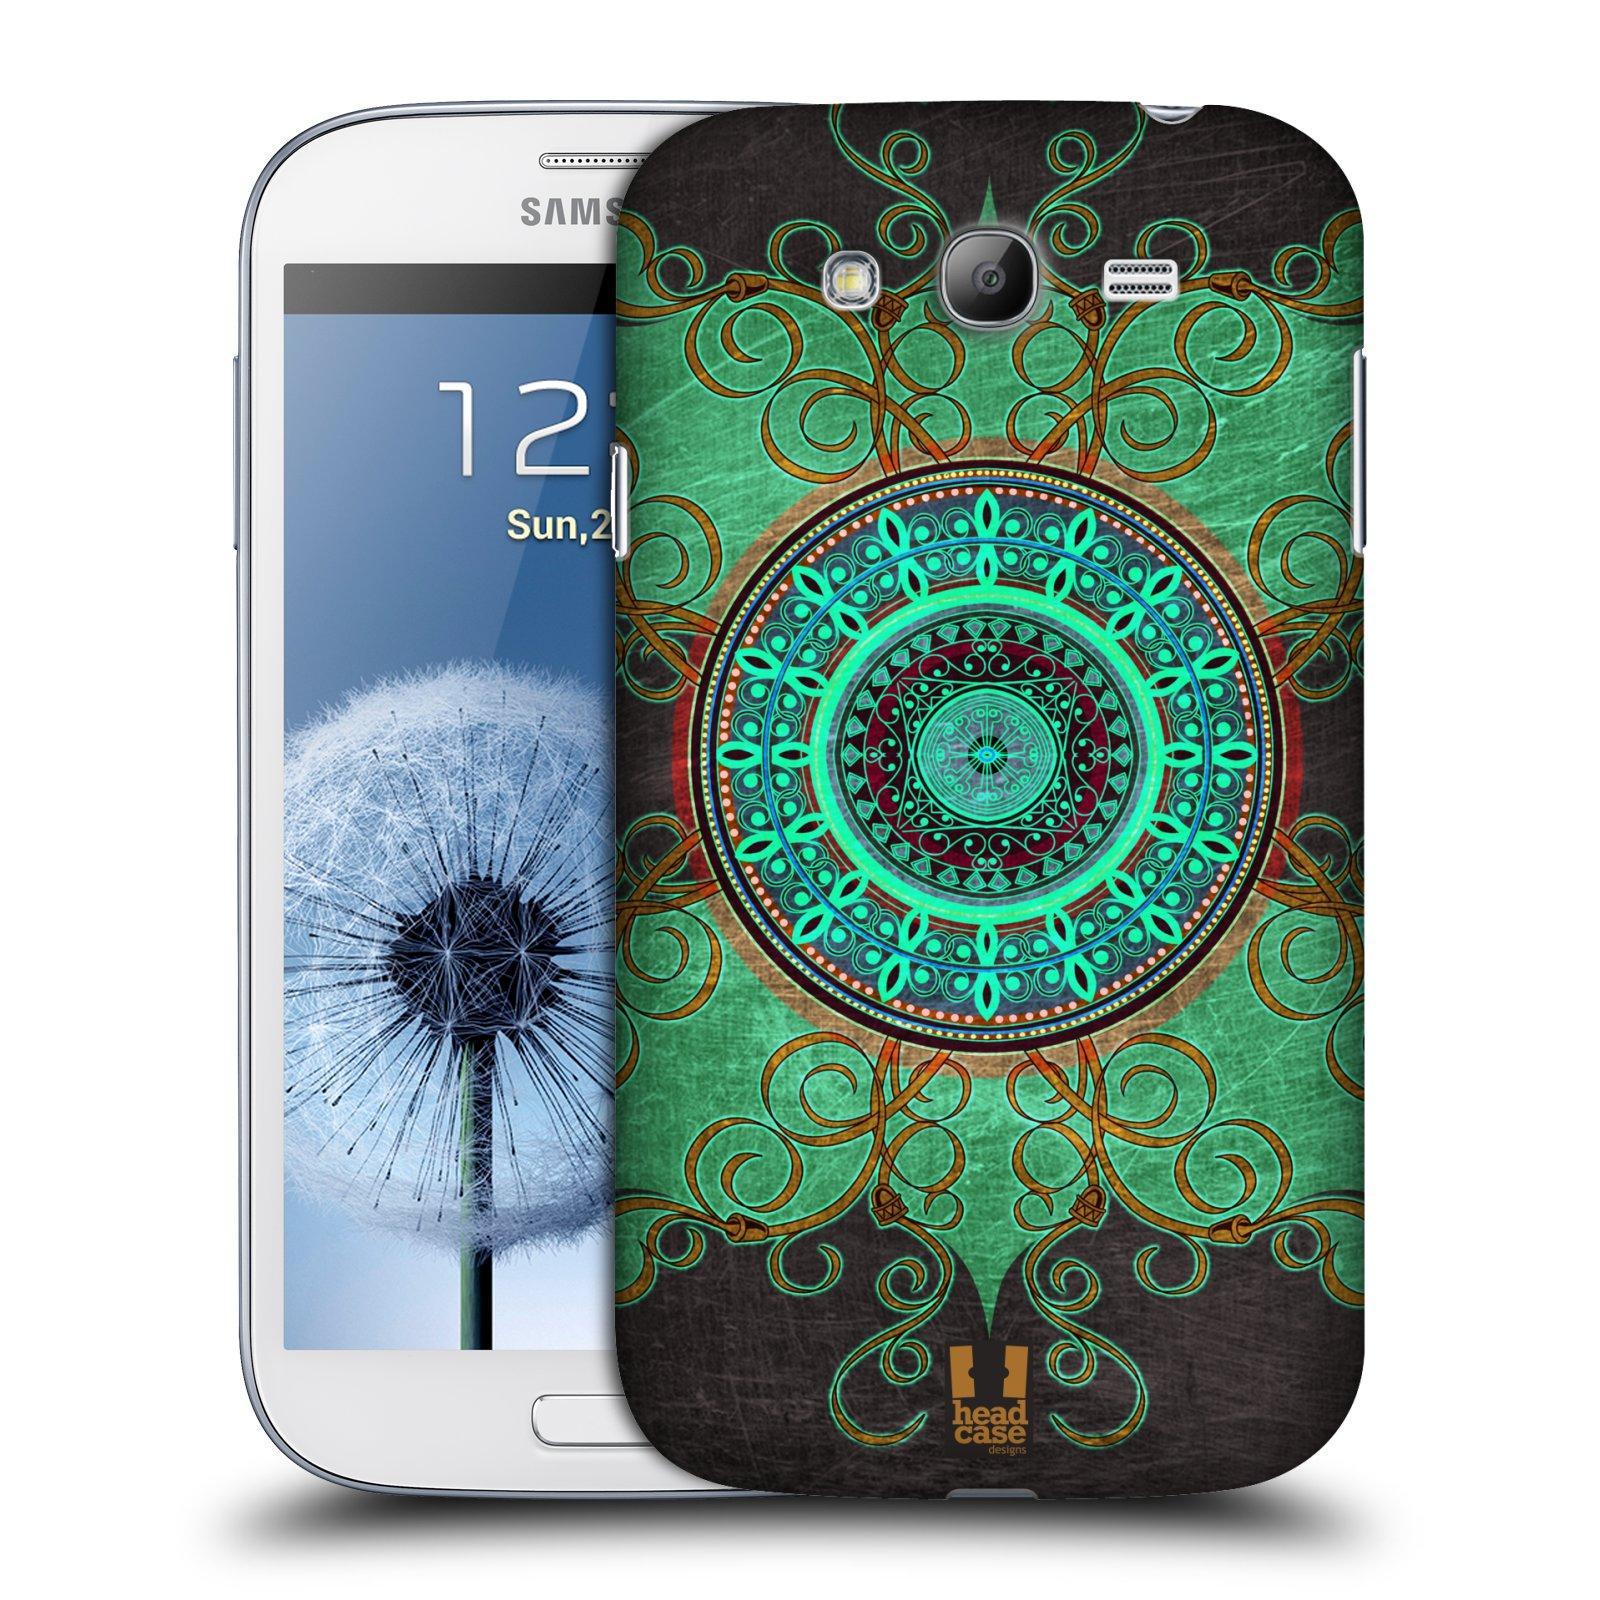 Pouzdra Samsung Plastov Pouzdro Na Mobil Galaxy Grand Neo Plus I9060 Head Case Arab Mandala